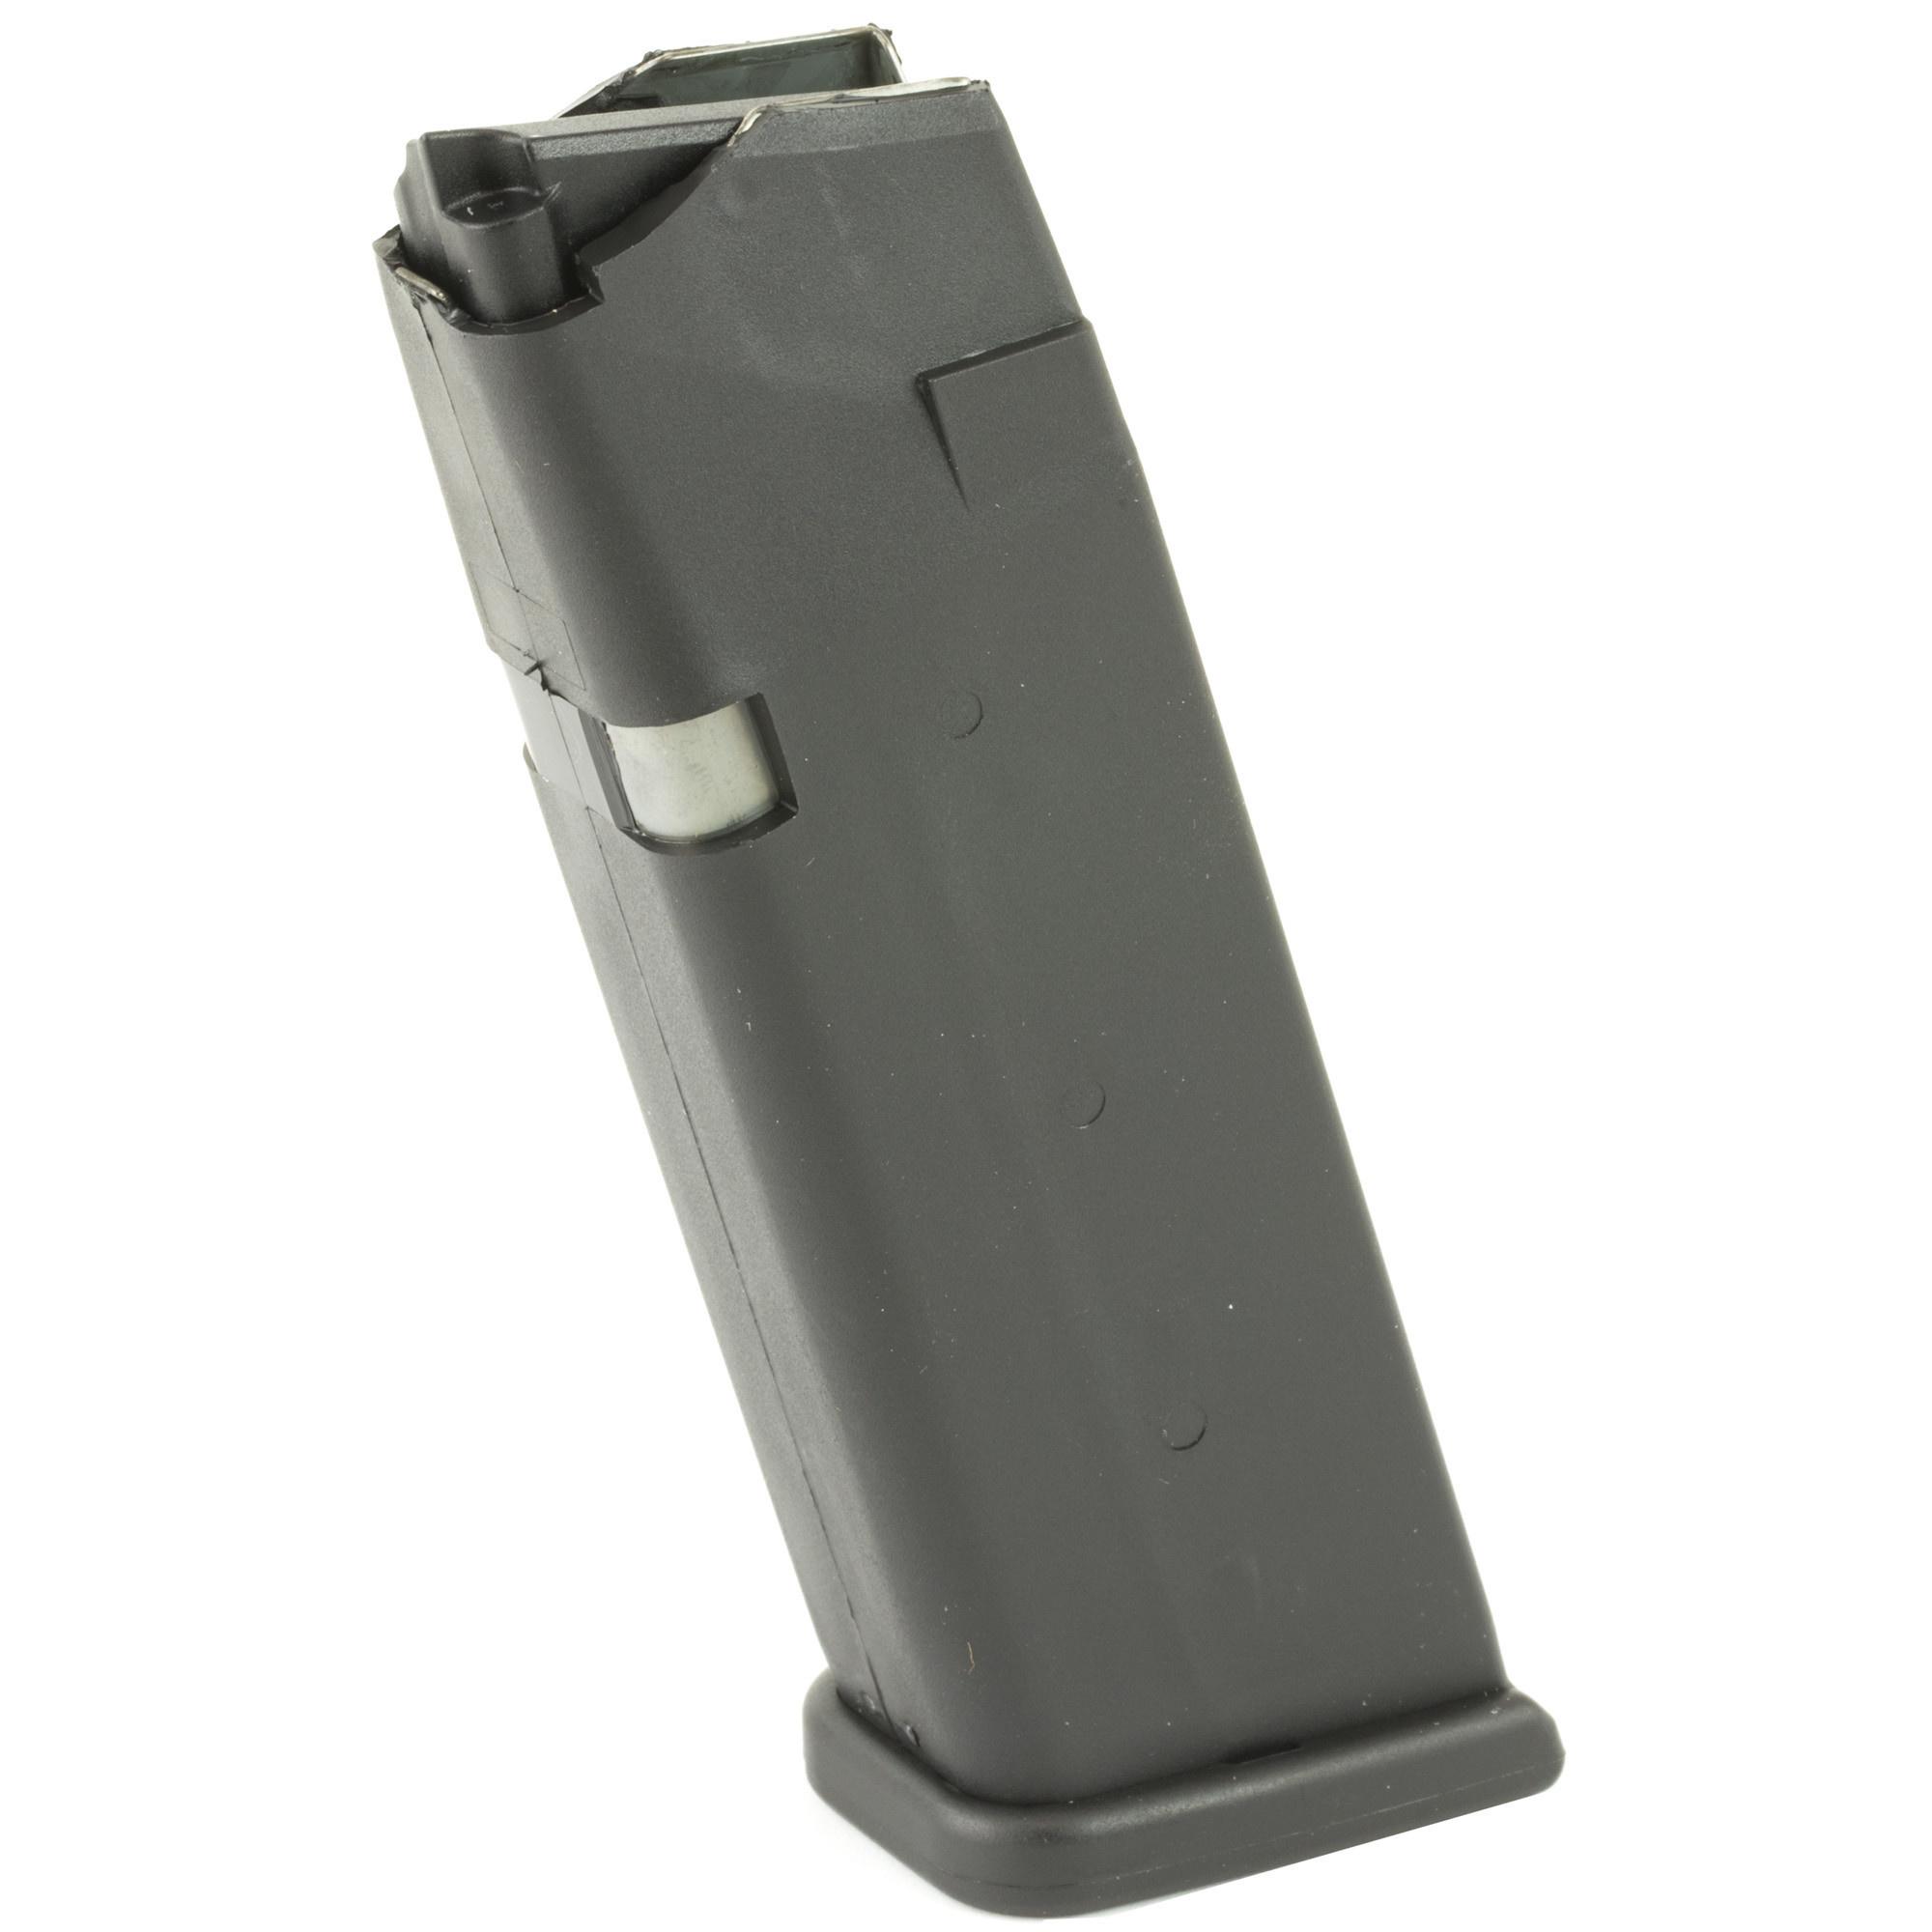 Glock OEM Magazine G21/41 45ACP 10Rd